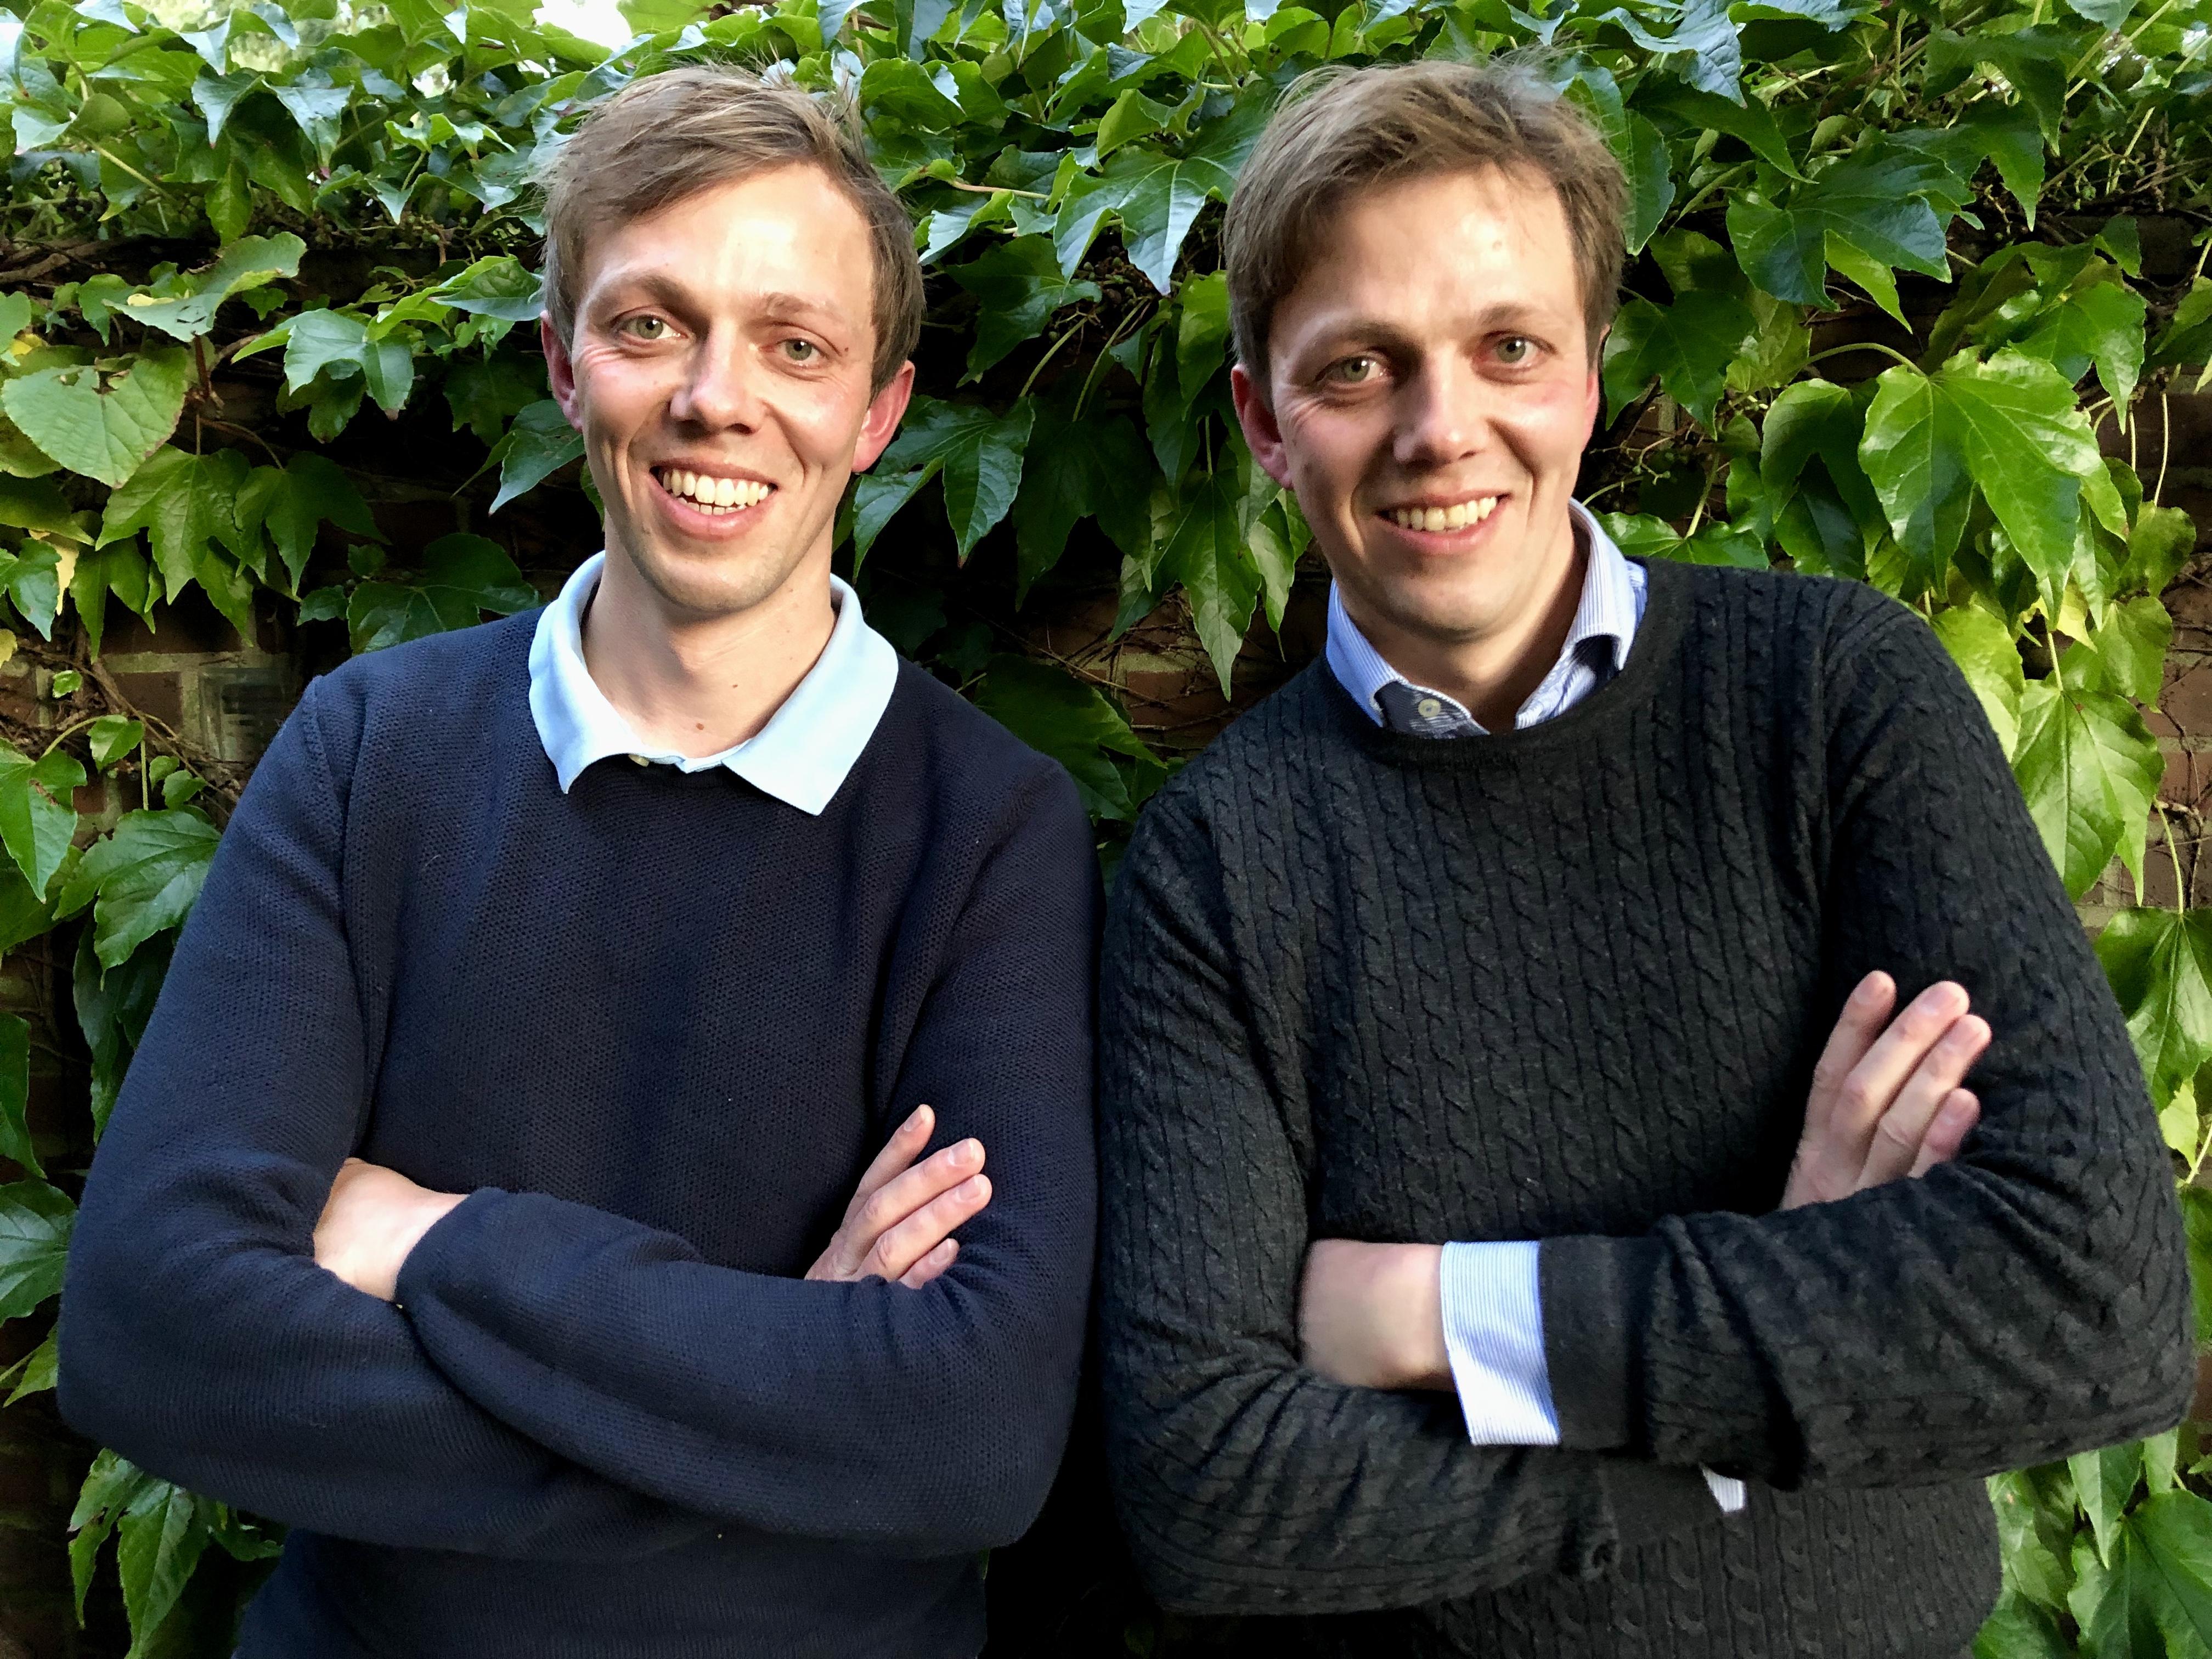 Christoph und Philipp Buchholz